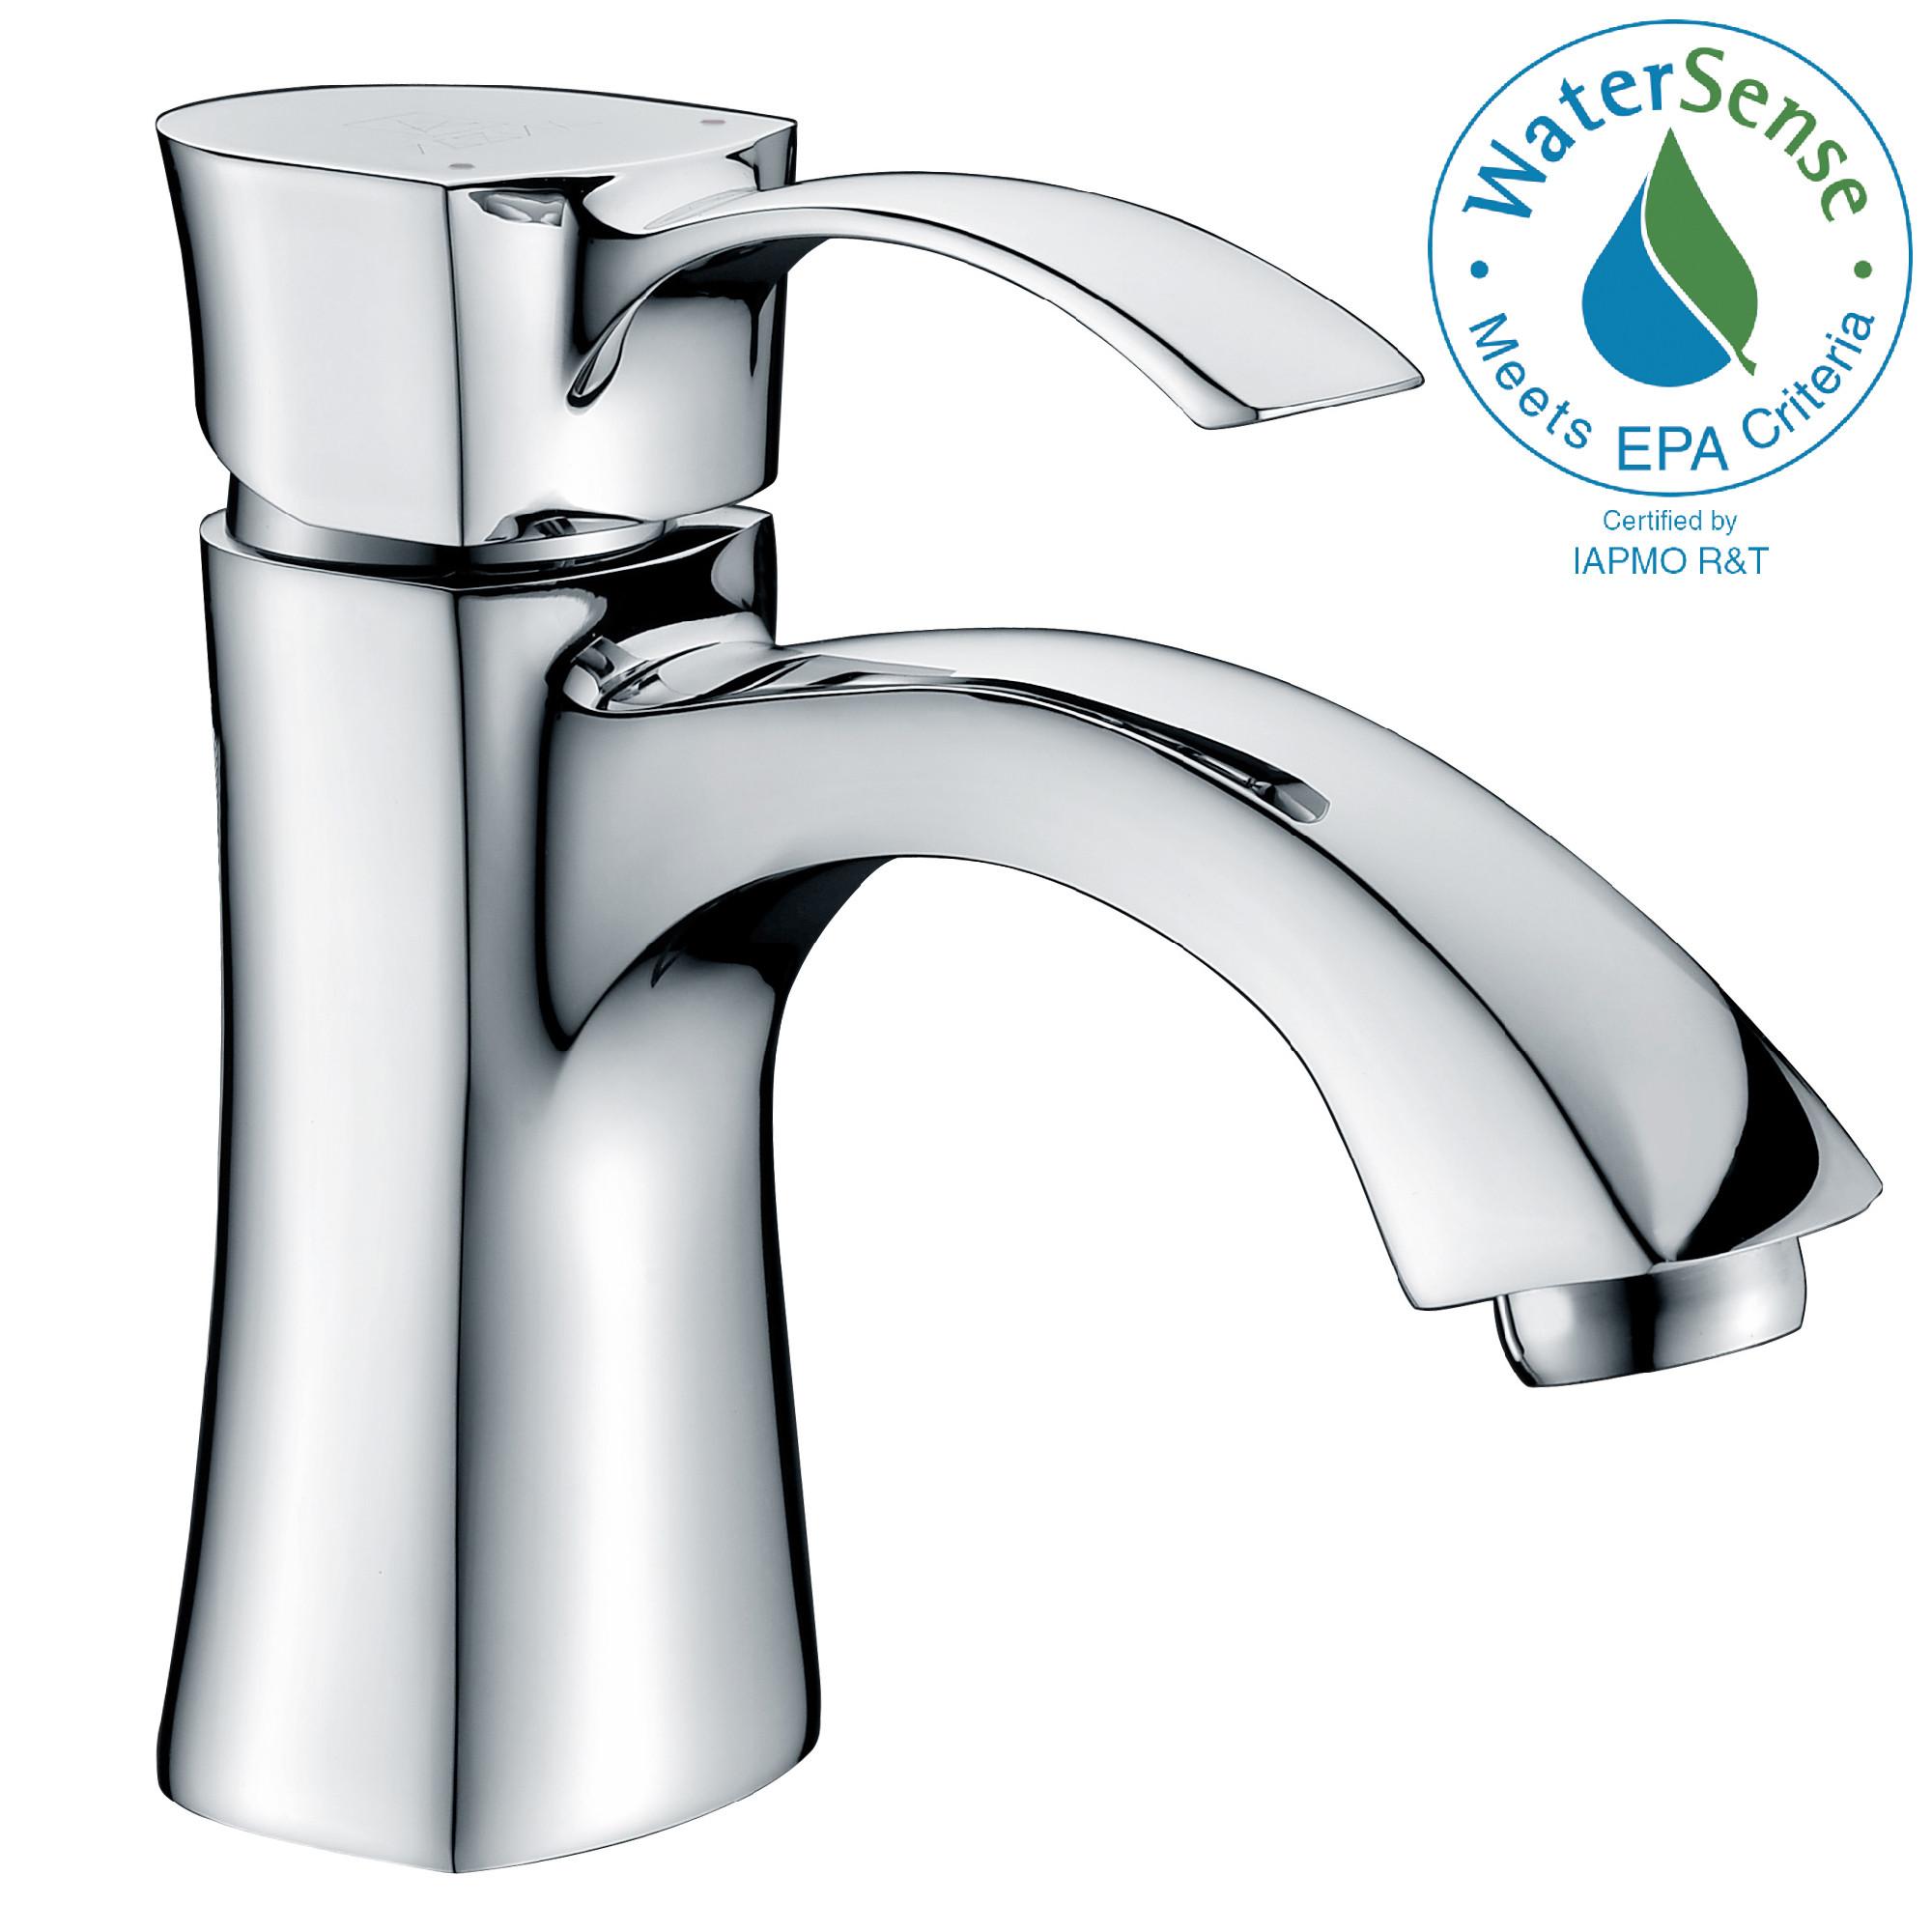 ANZZI L-AZ012 Alto Single Lever Handle Bathroom Faucet In Polished Chrome